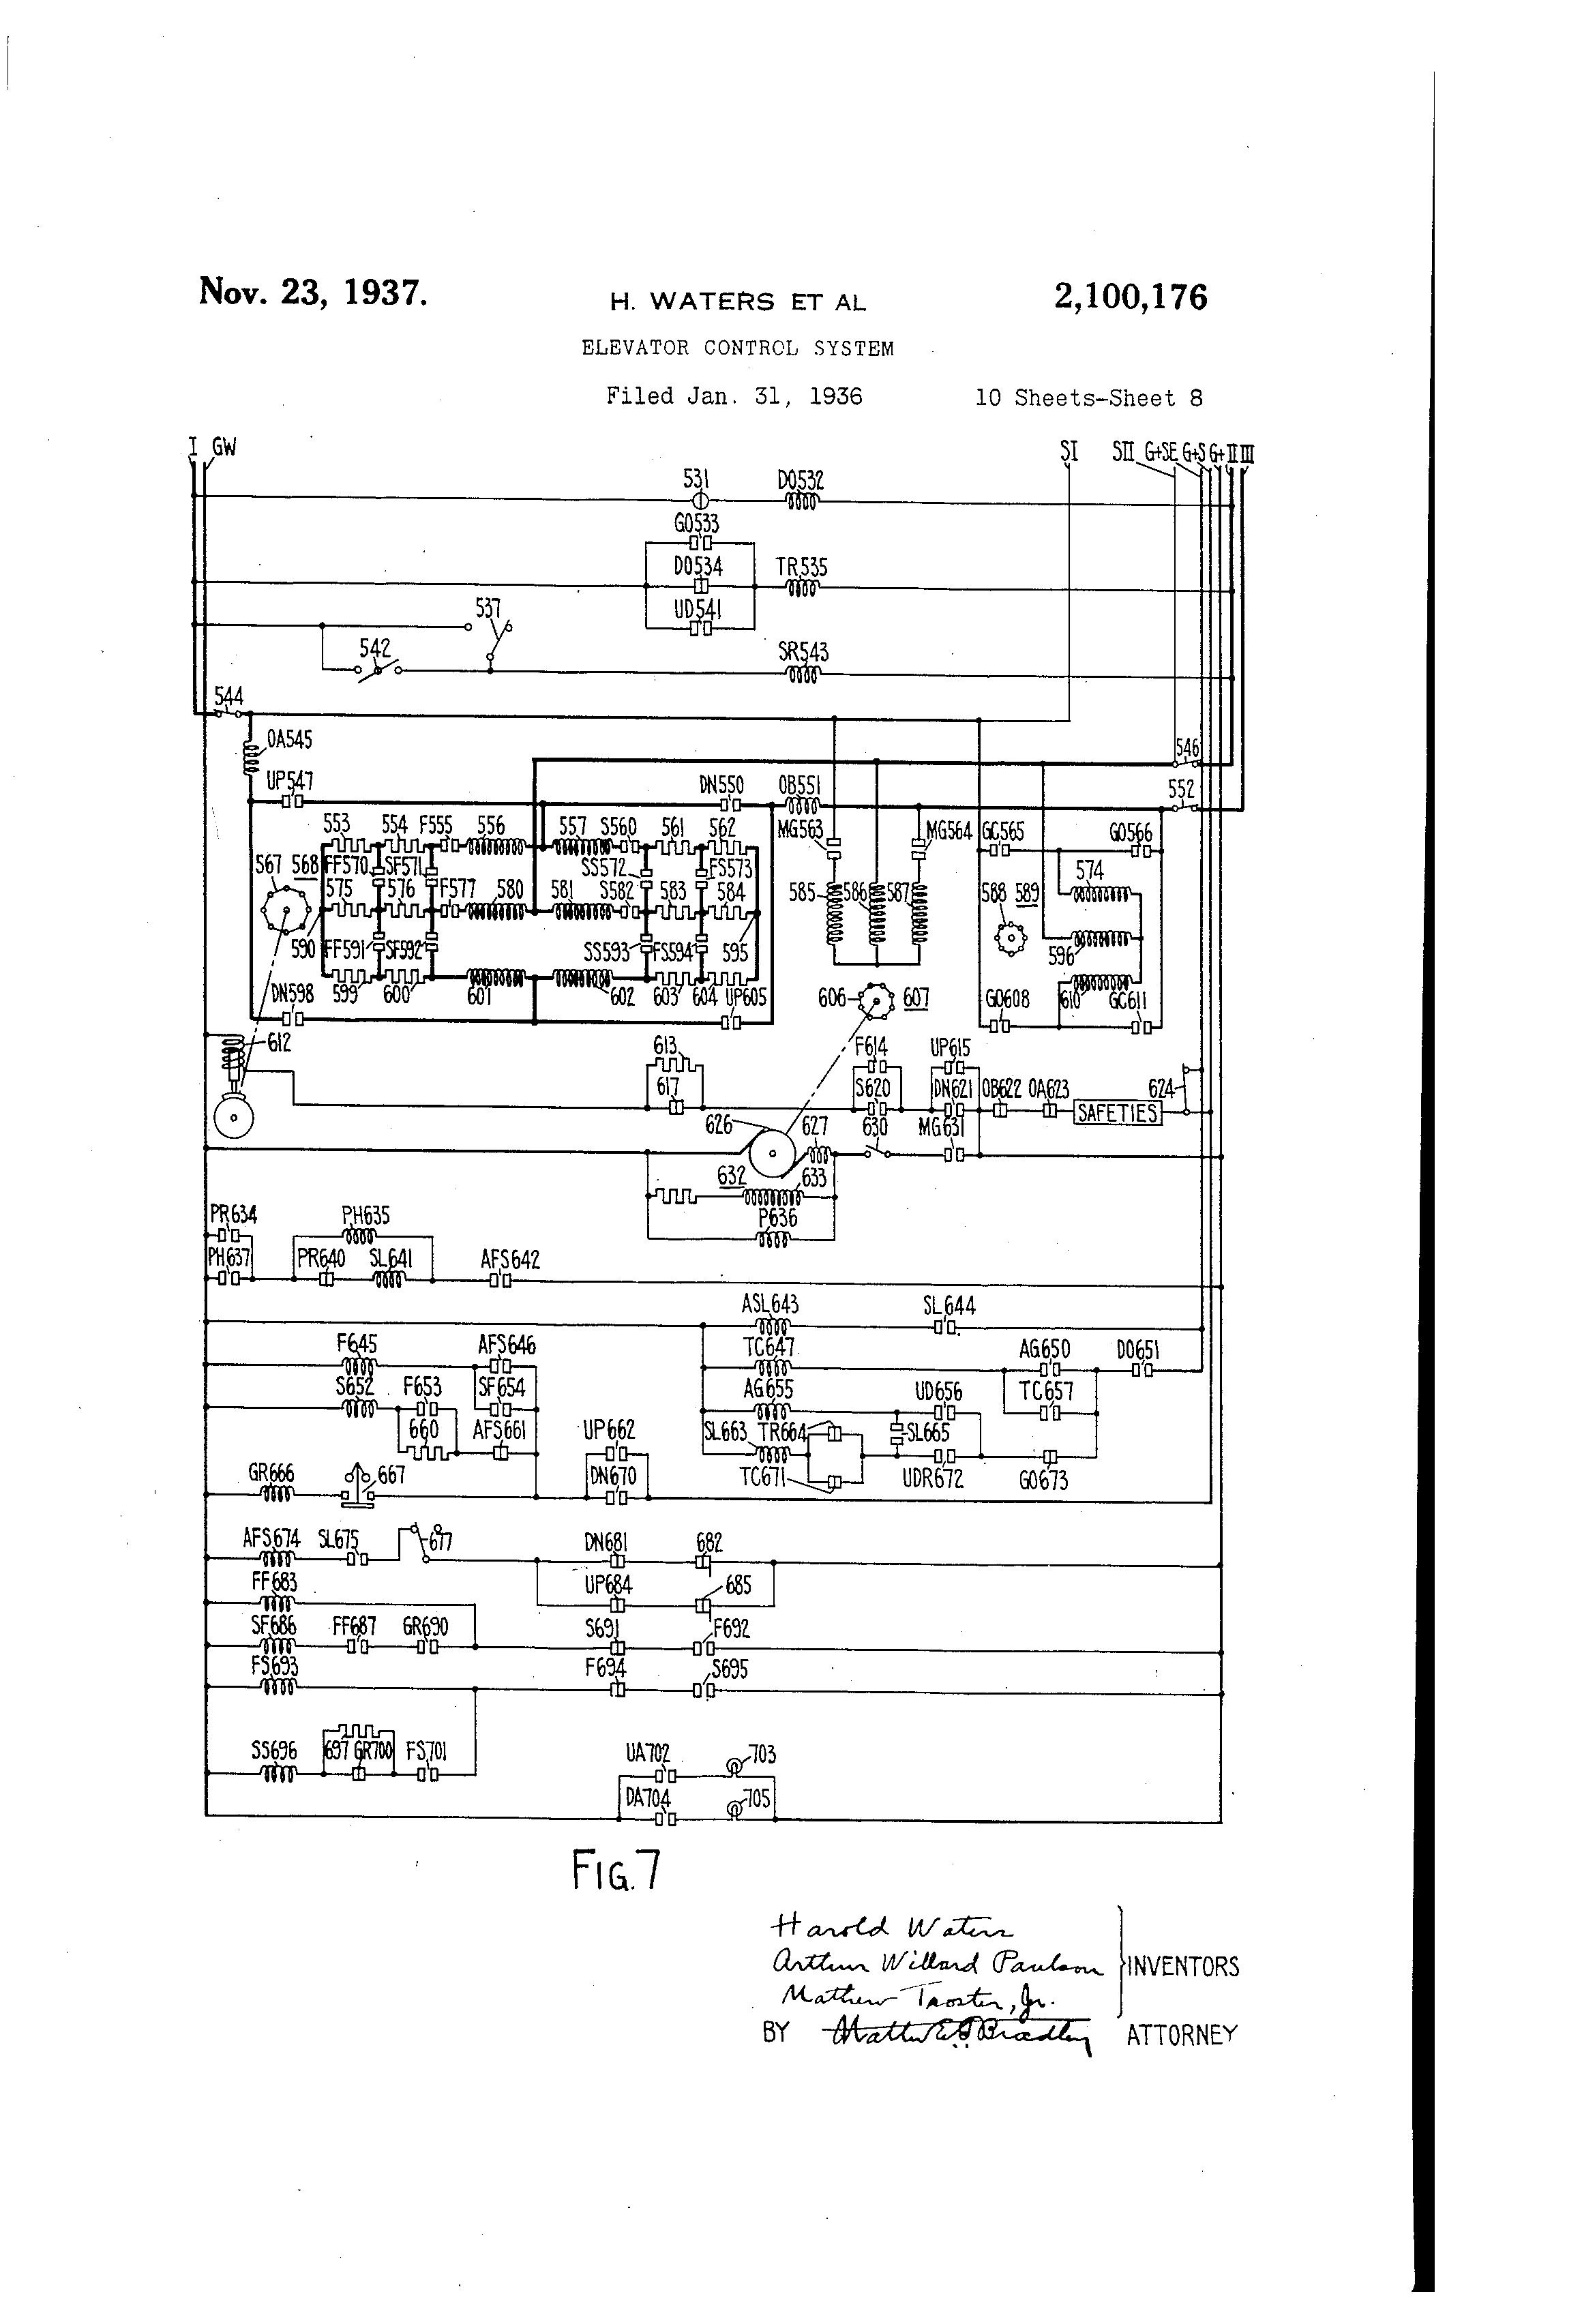 US2100176 7 patent us2100176 elevator control system google patents otis elevators wiring diagrams at webbmarketing.co